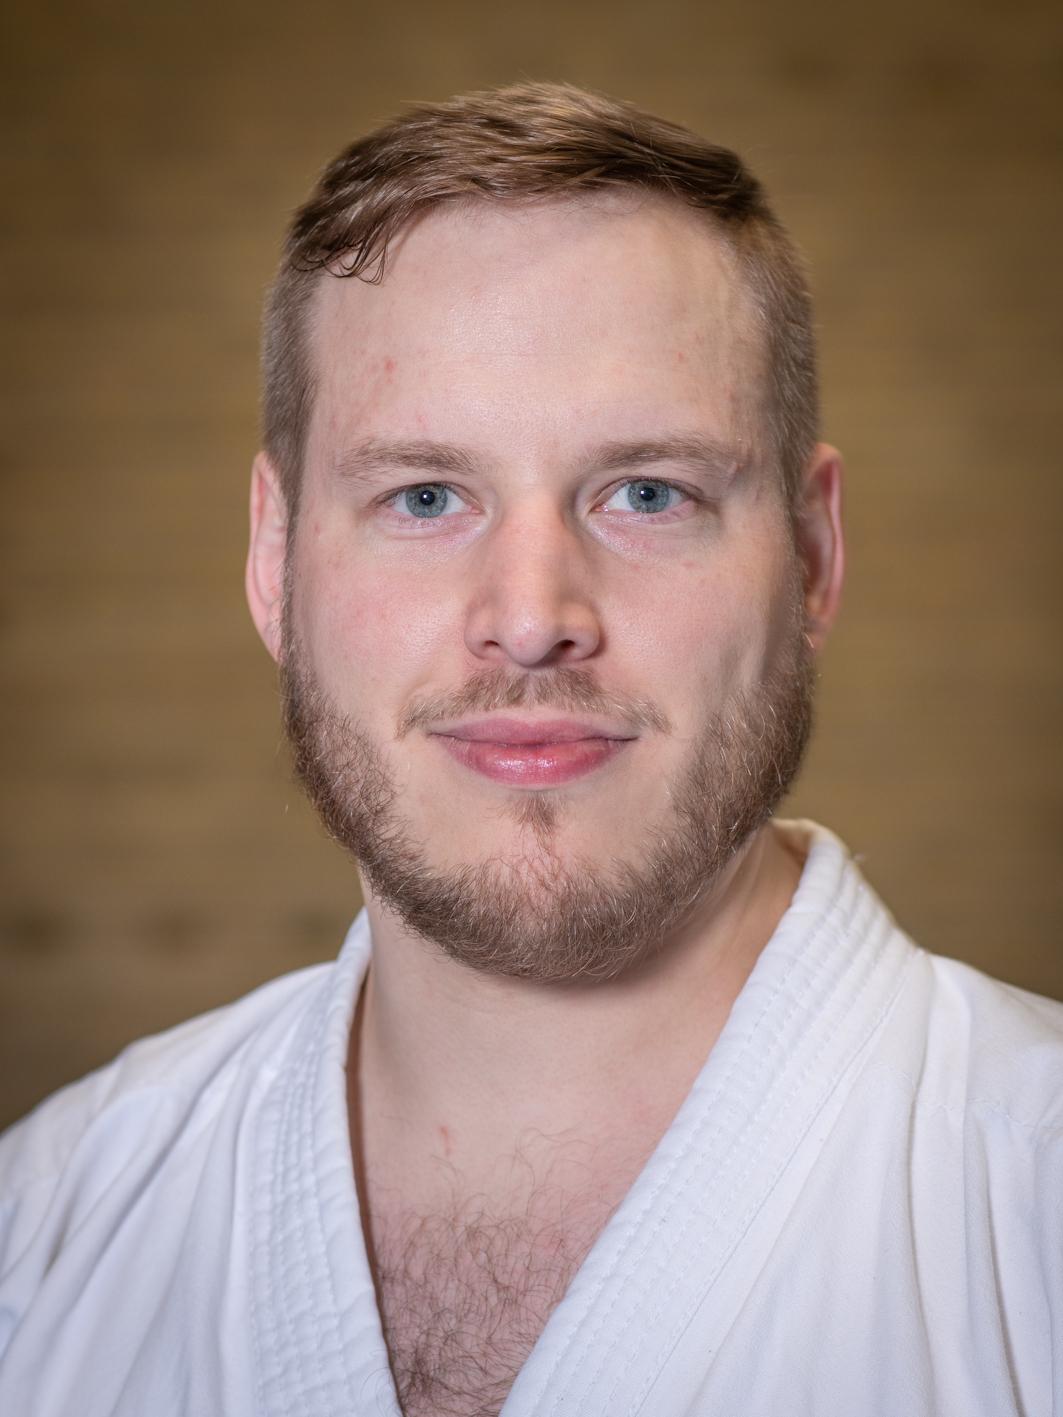 Lasse Wiberg Rasmussen